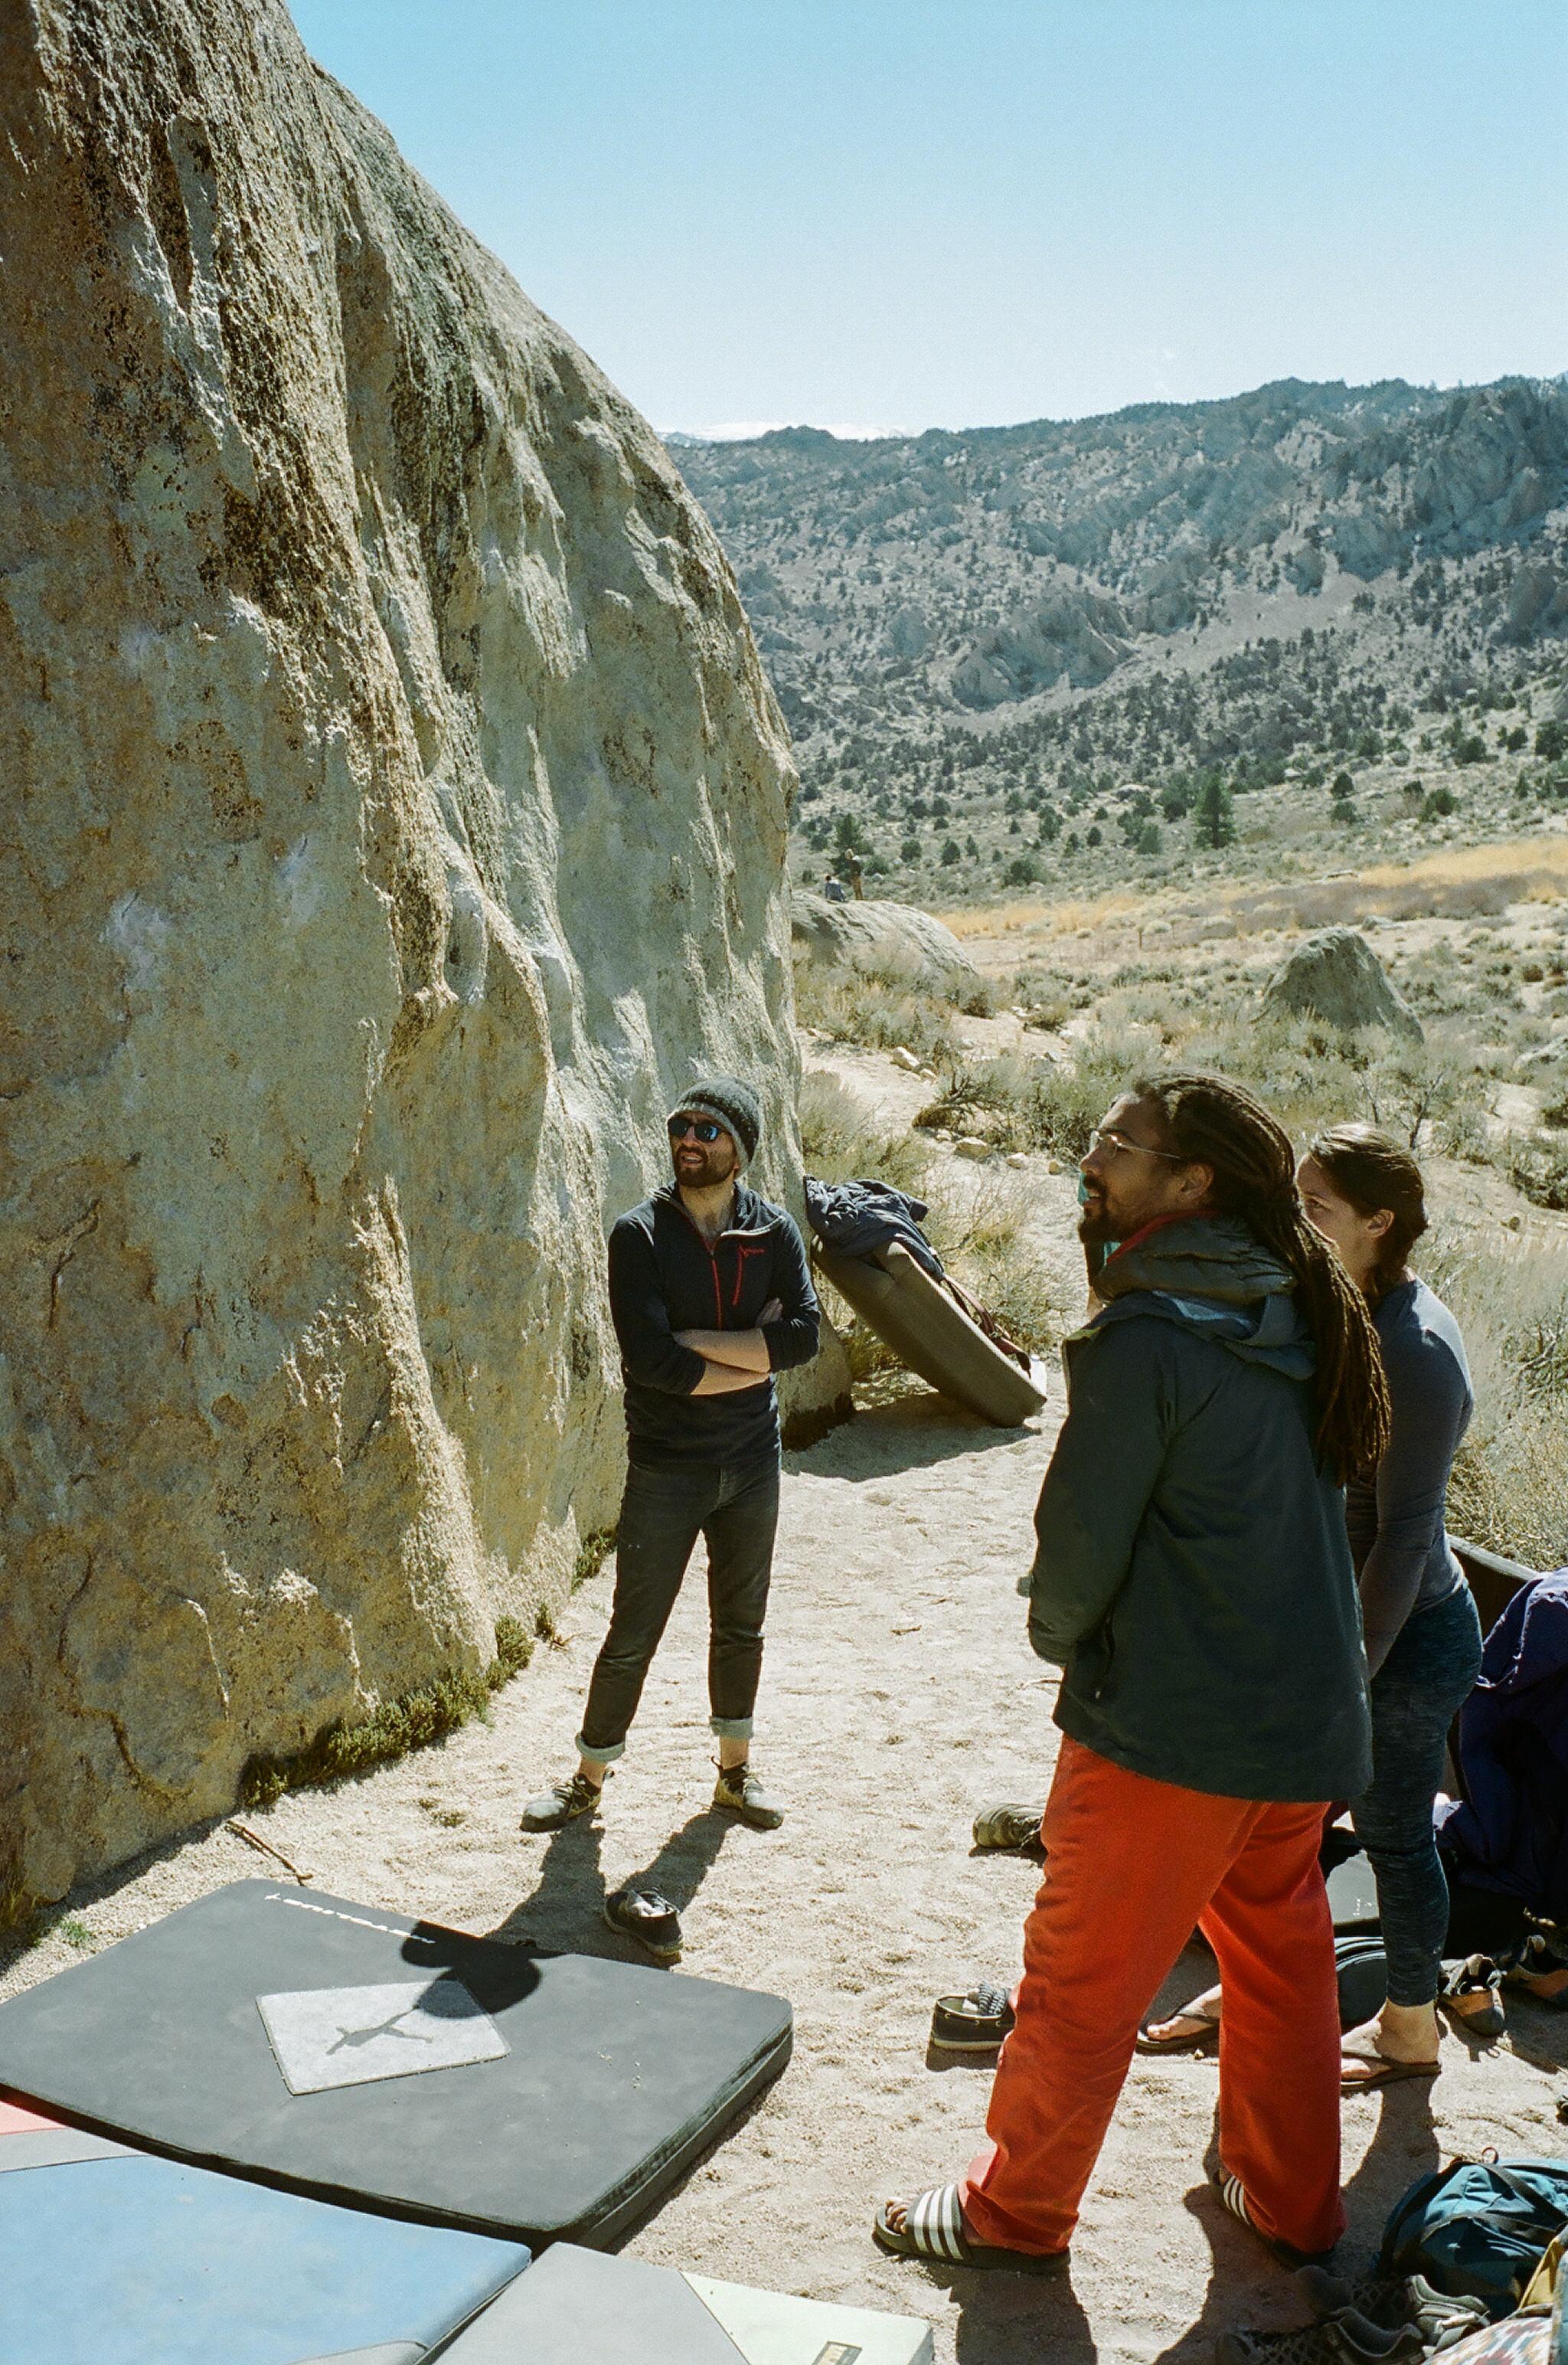 local rock climbing guides